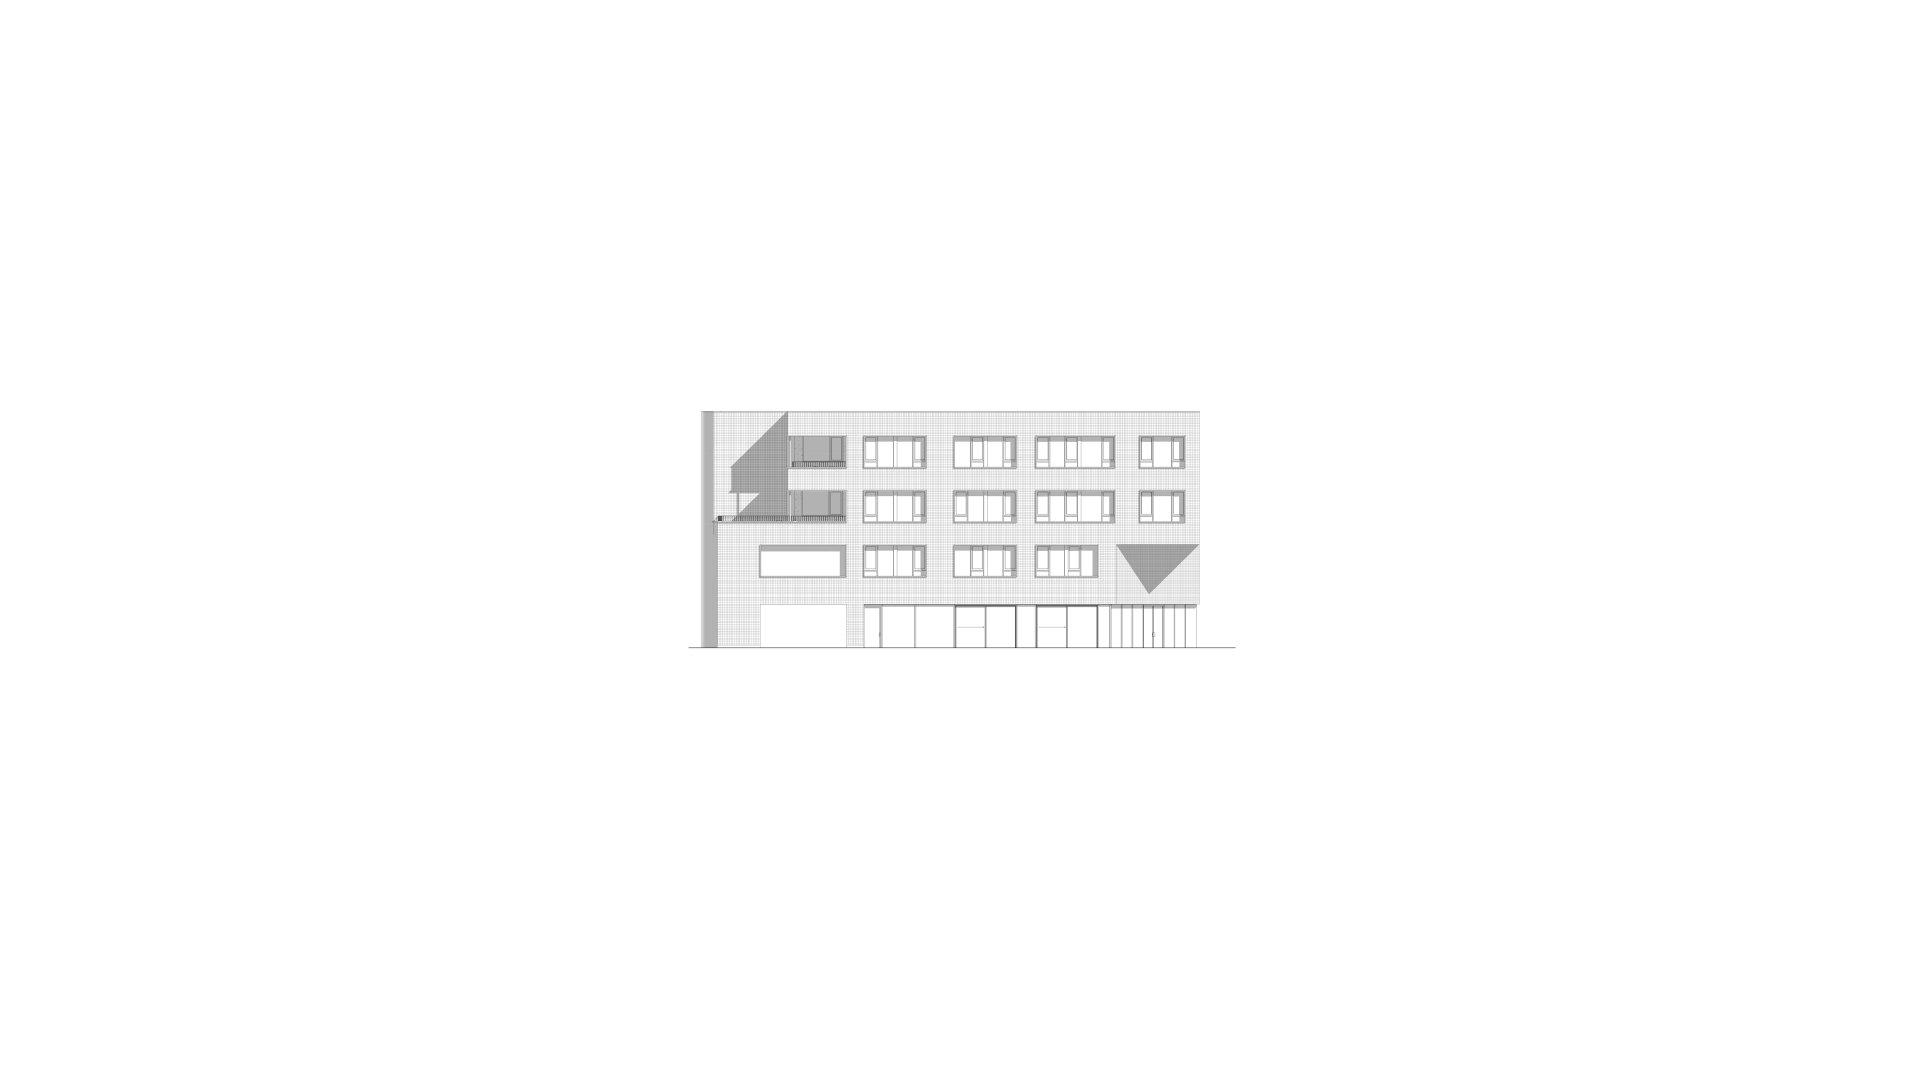 Rauter, collectieve woningen, Anderlecht-270917536